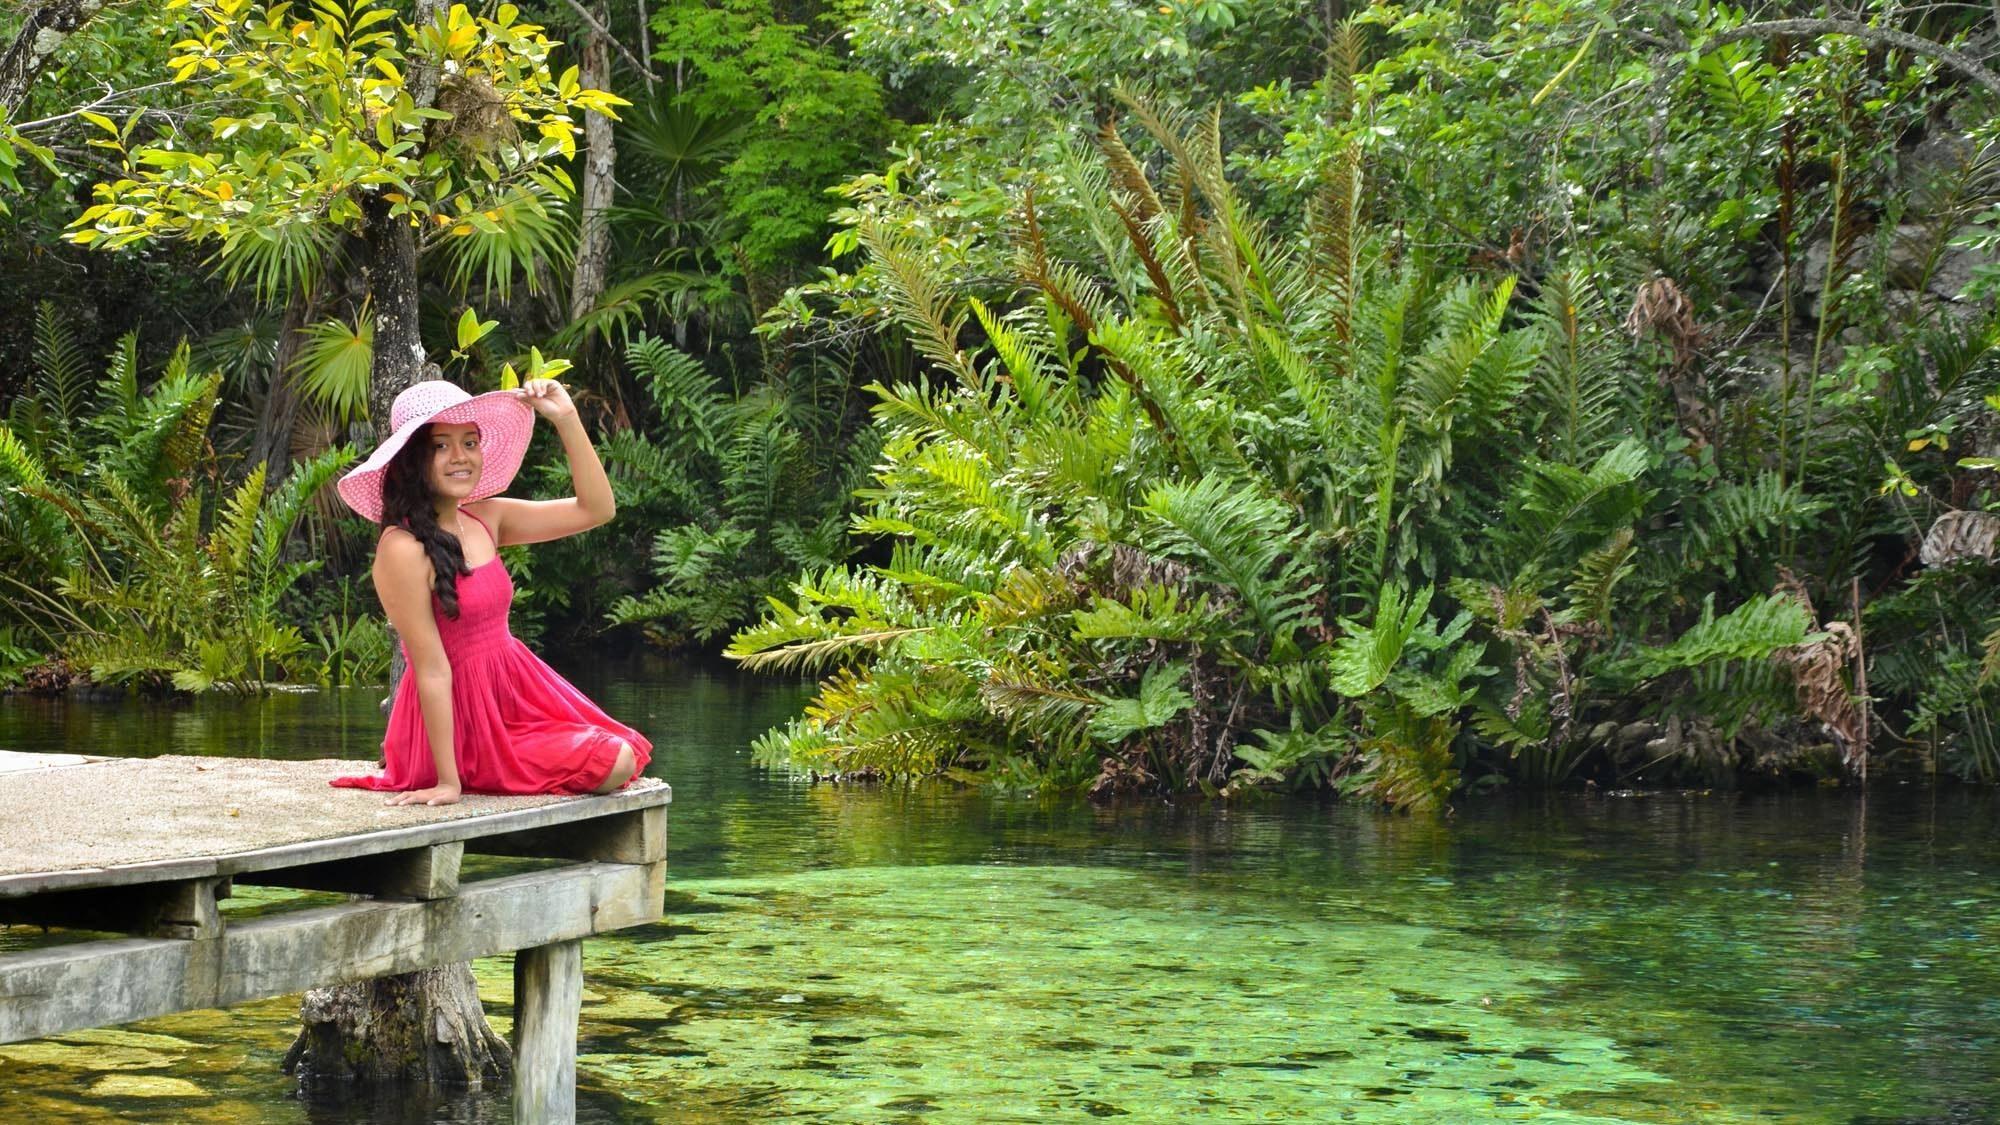 Natural Wonders Hidden In Mexico's Deep Waters